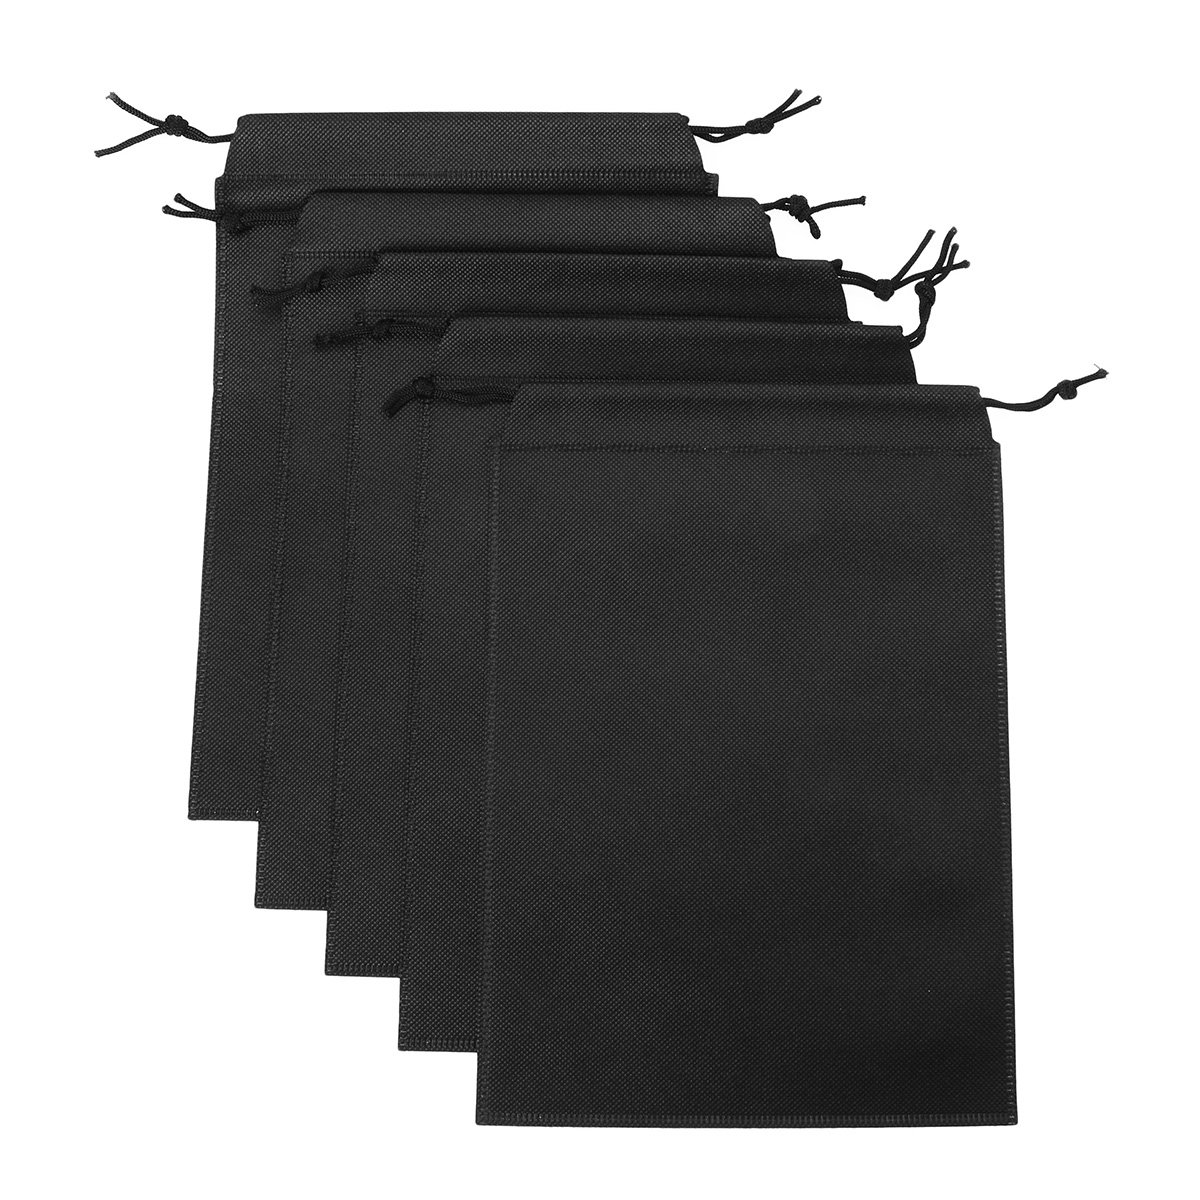 Freebily 5PCS Adult Game Toys Product Lint Drawstring Storage Bag Costume- Light Weight Black One Size